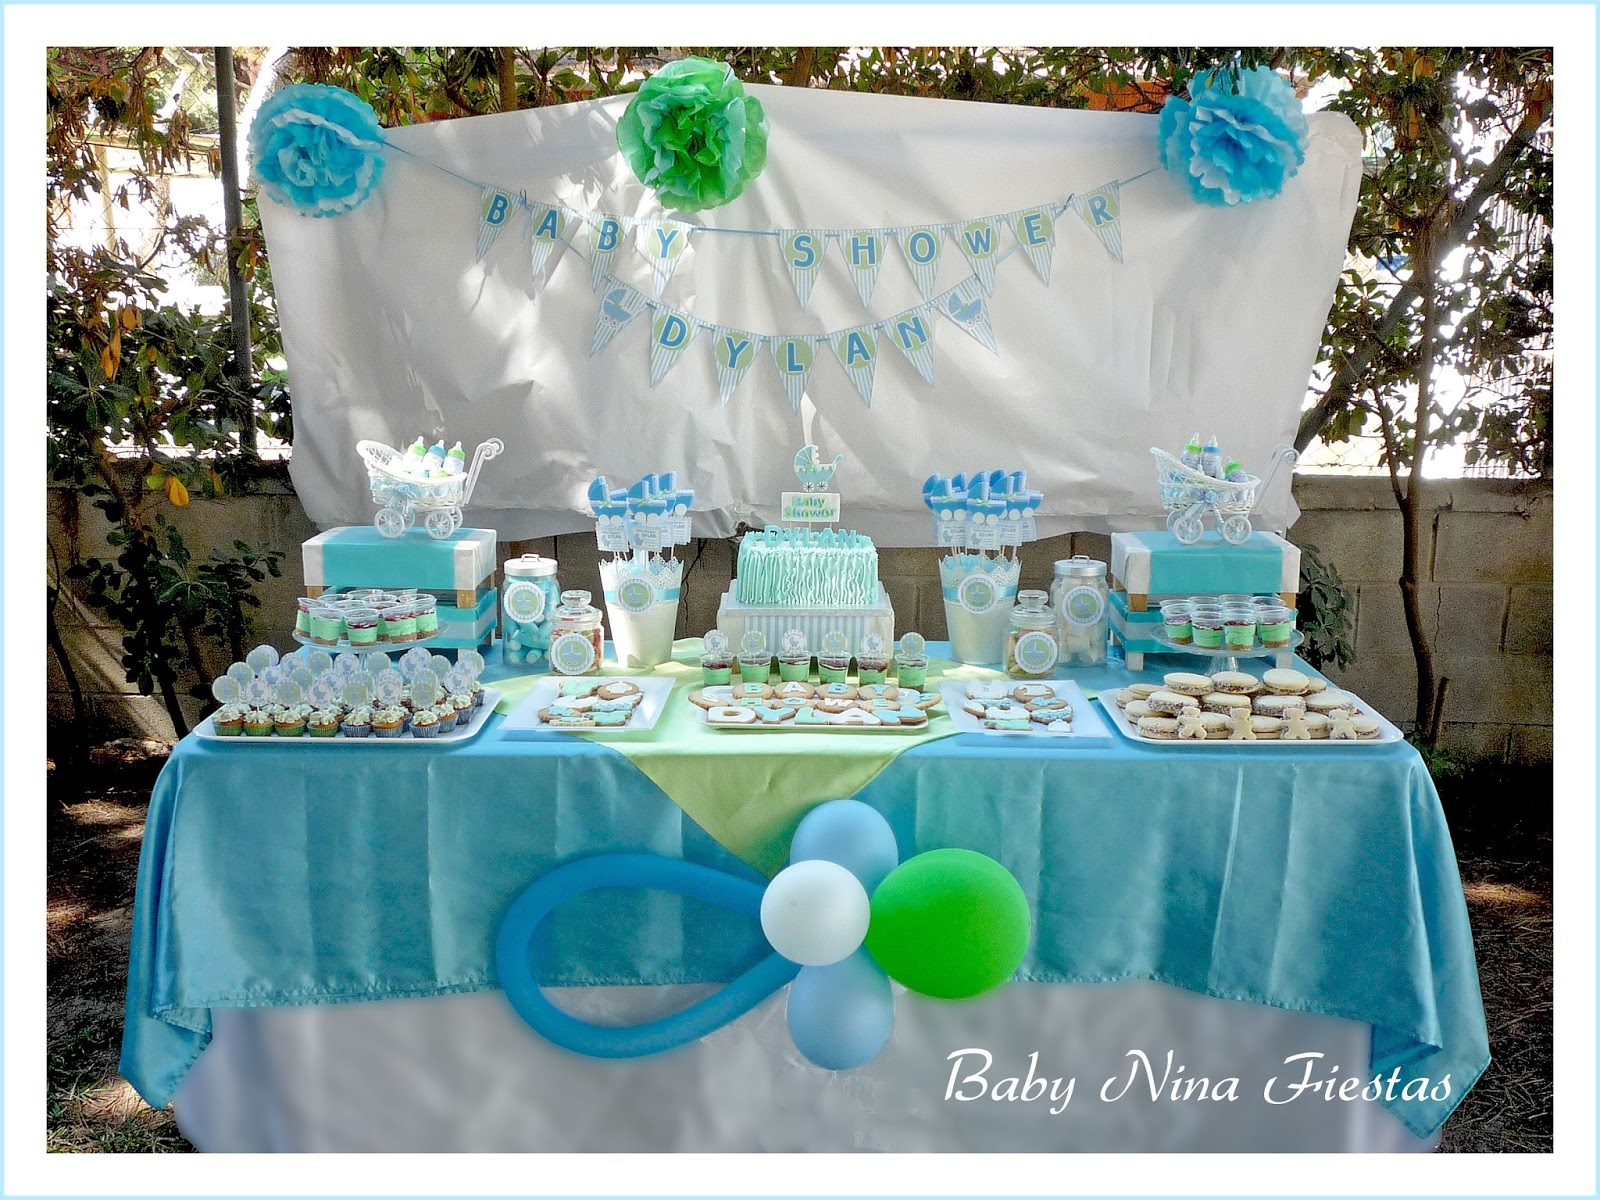 Baby nina fiestas baby shower dylan - Adornos baby shower nino ...